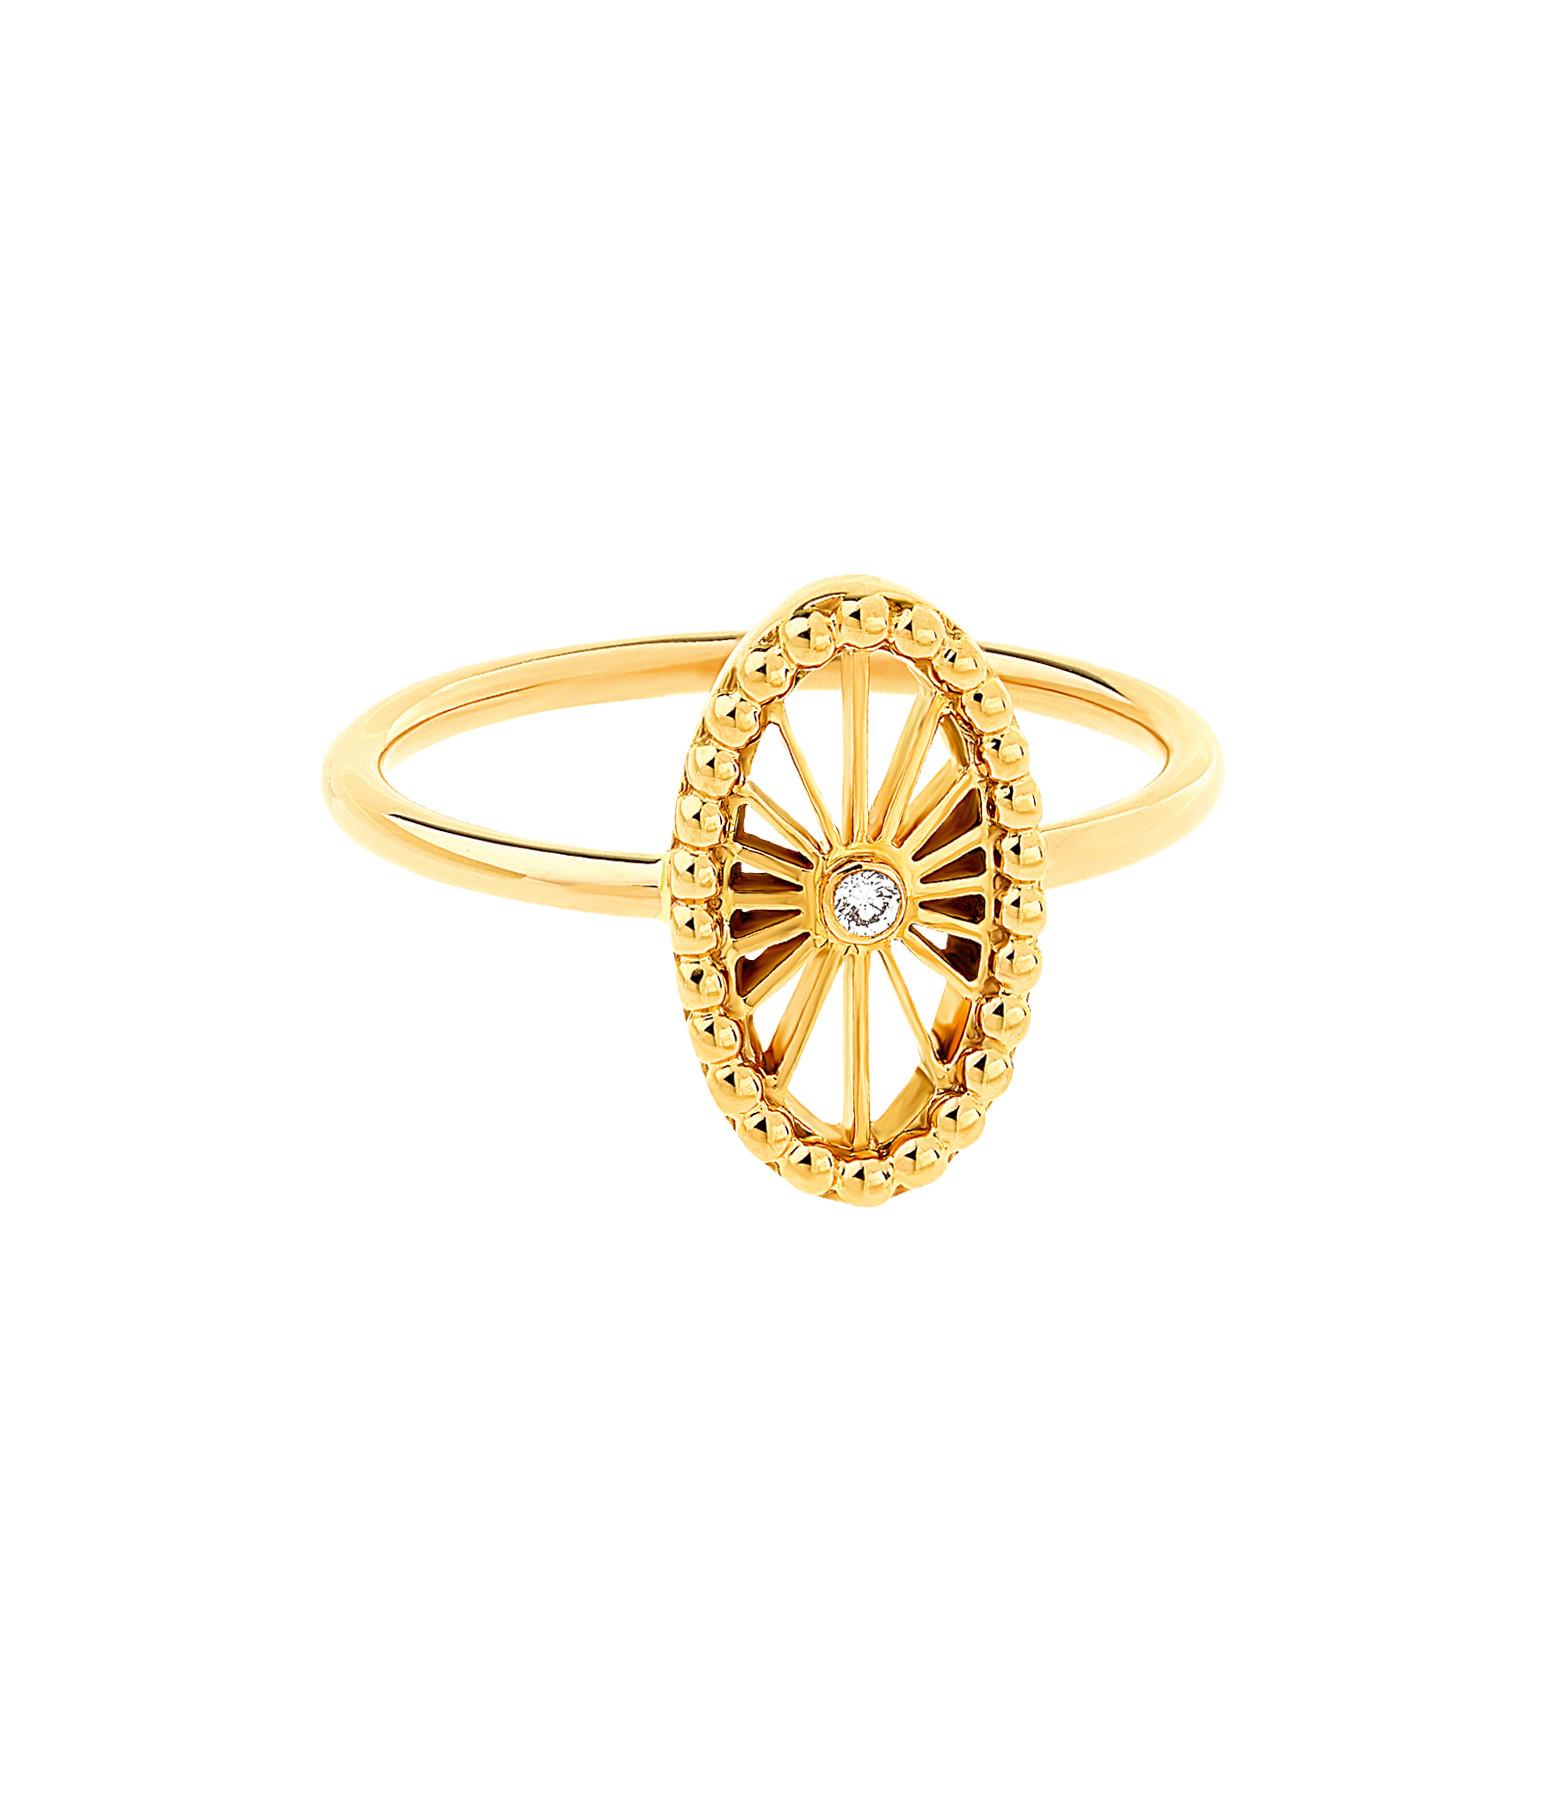 NAVA JOAILLERIE - Bague Mini-Cheyenne Ovale Diamants Or Jaune